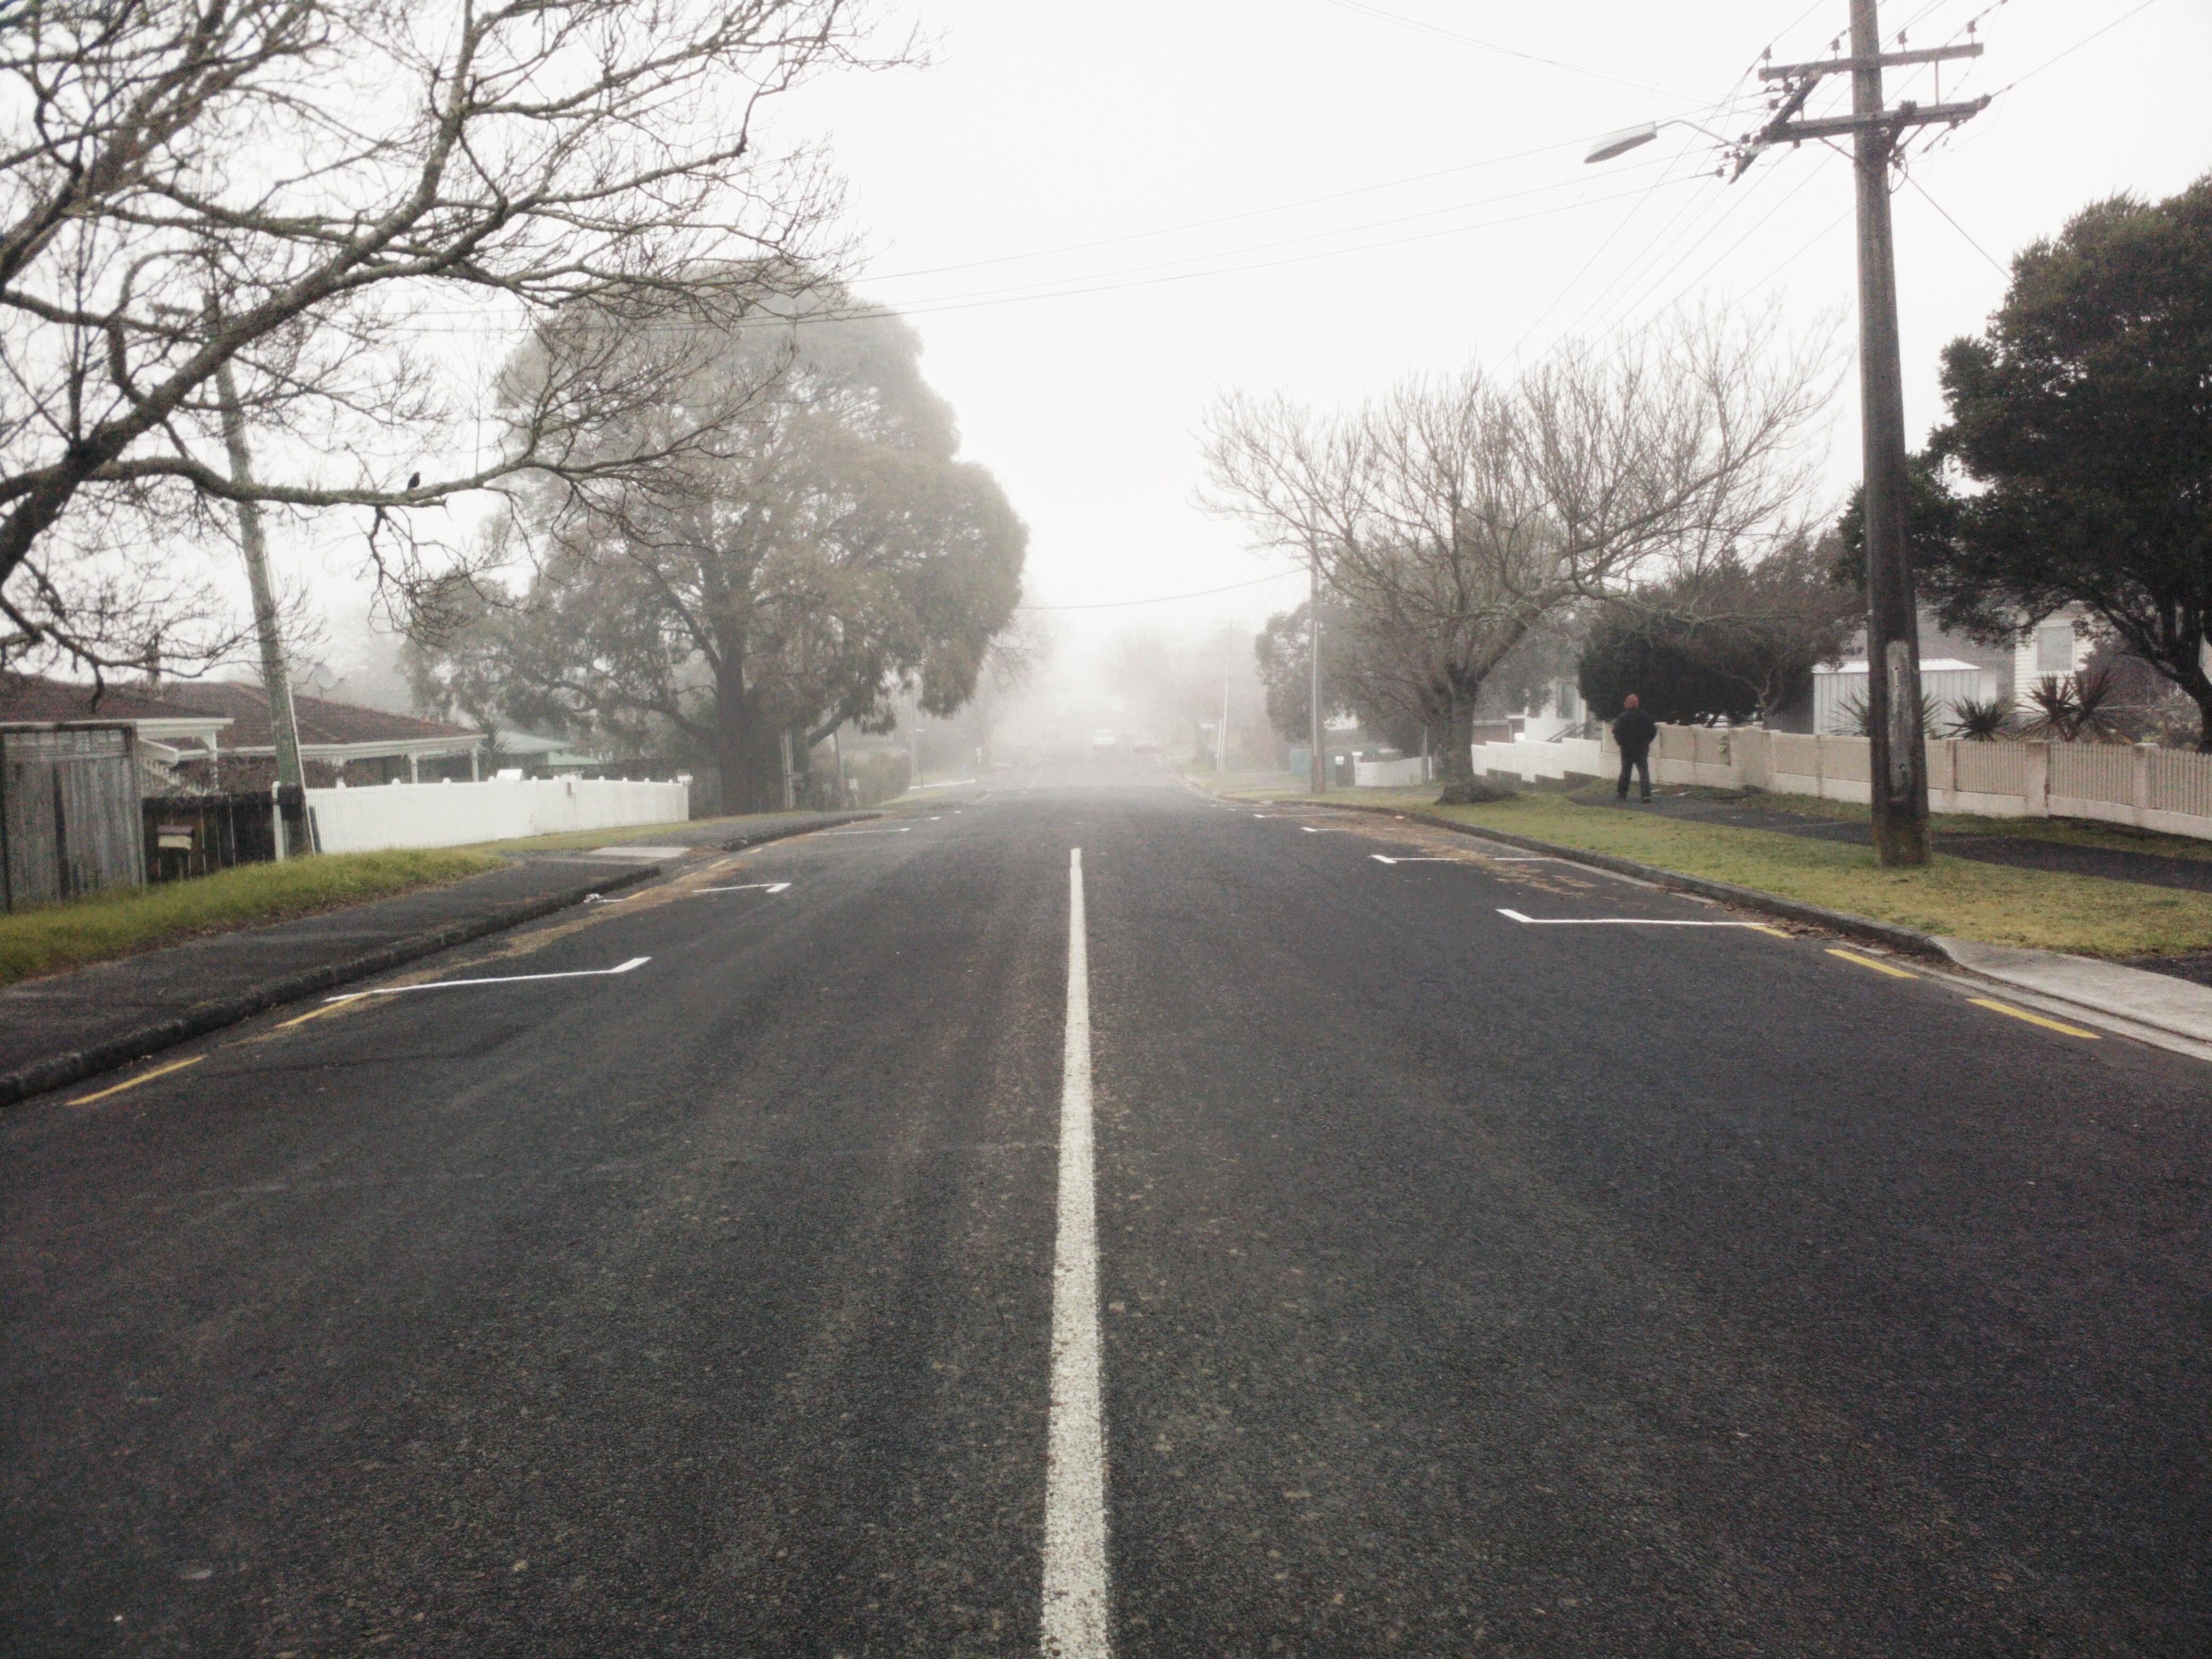 Melissa: Street View | the chasing fog club (Est. 2014)